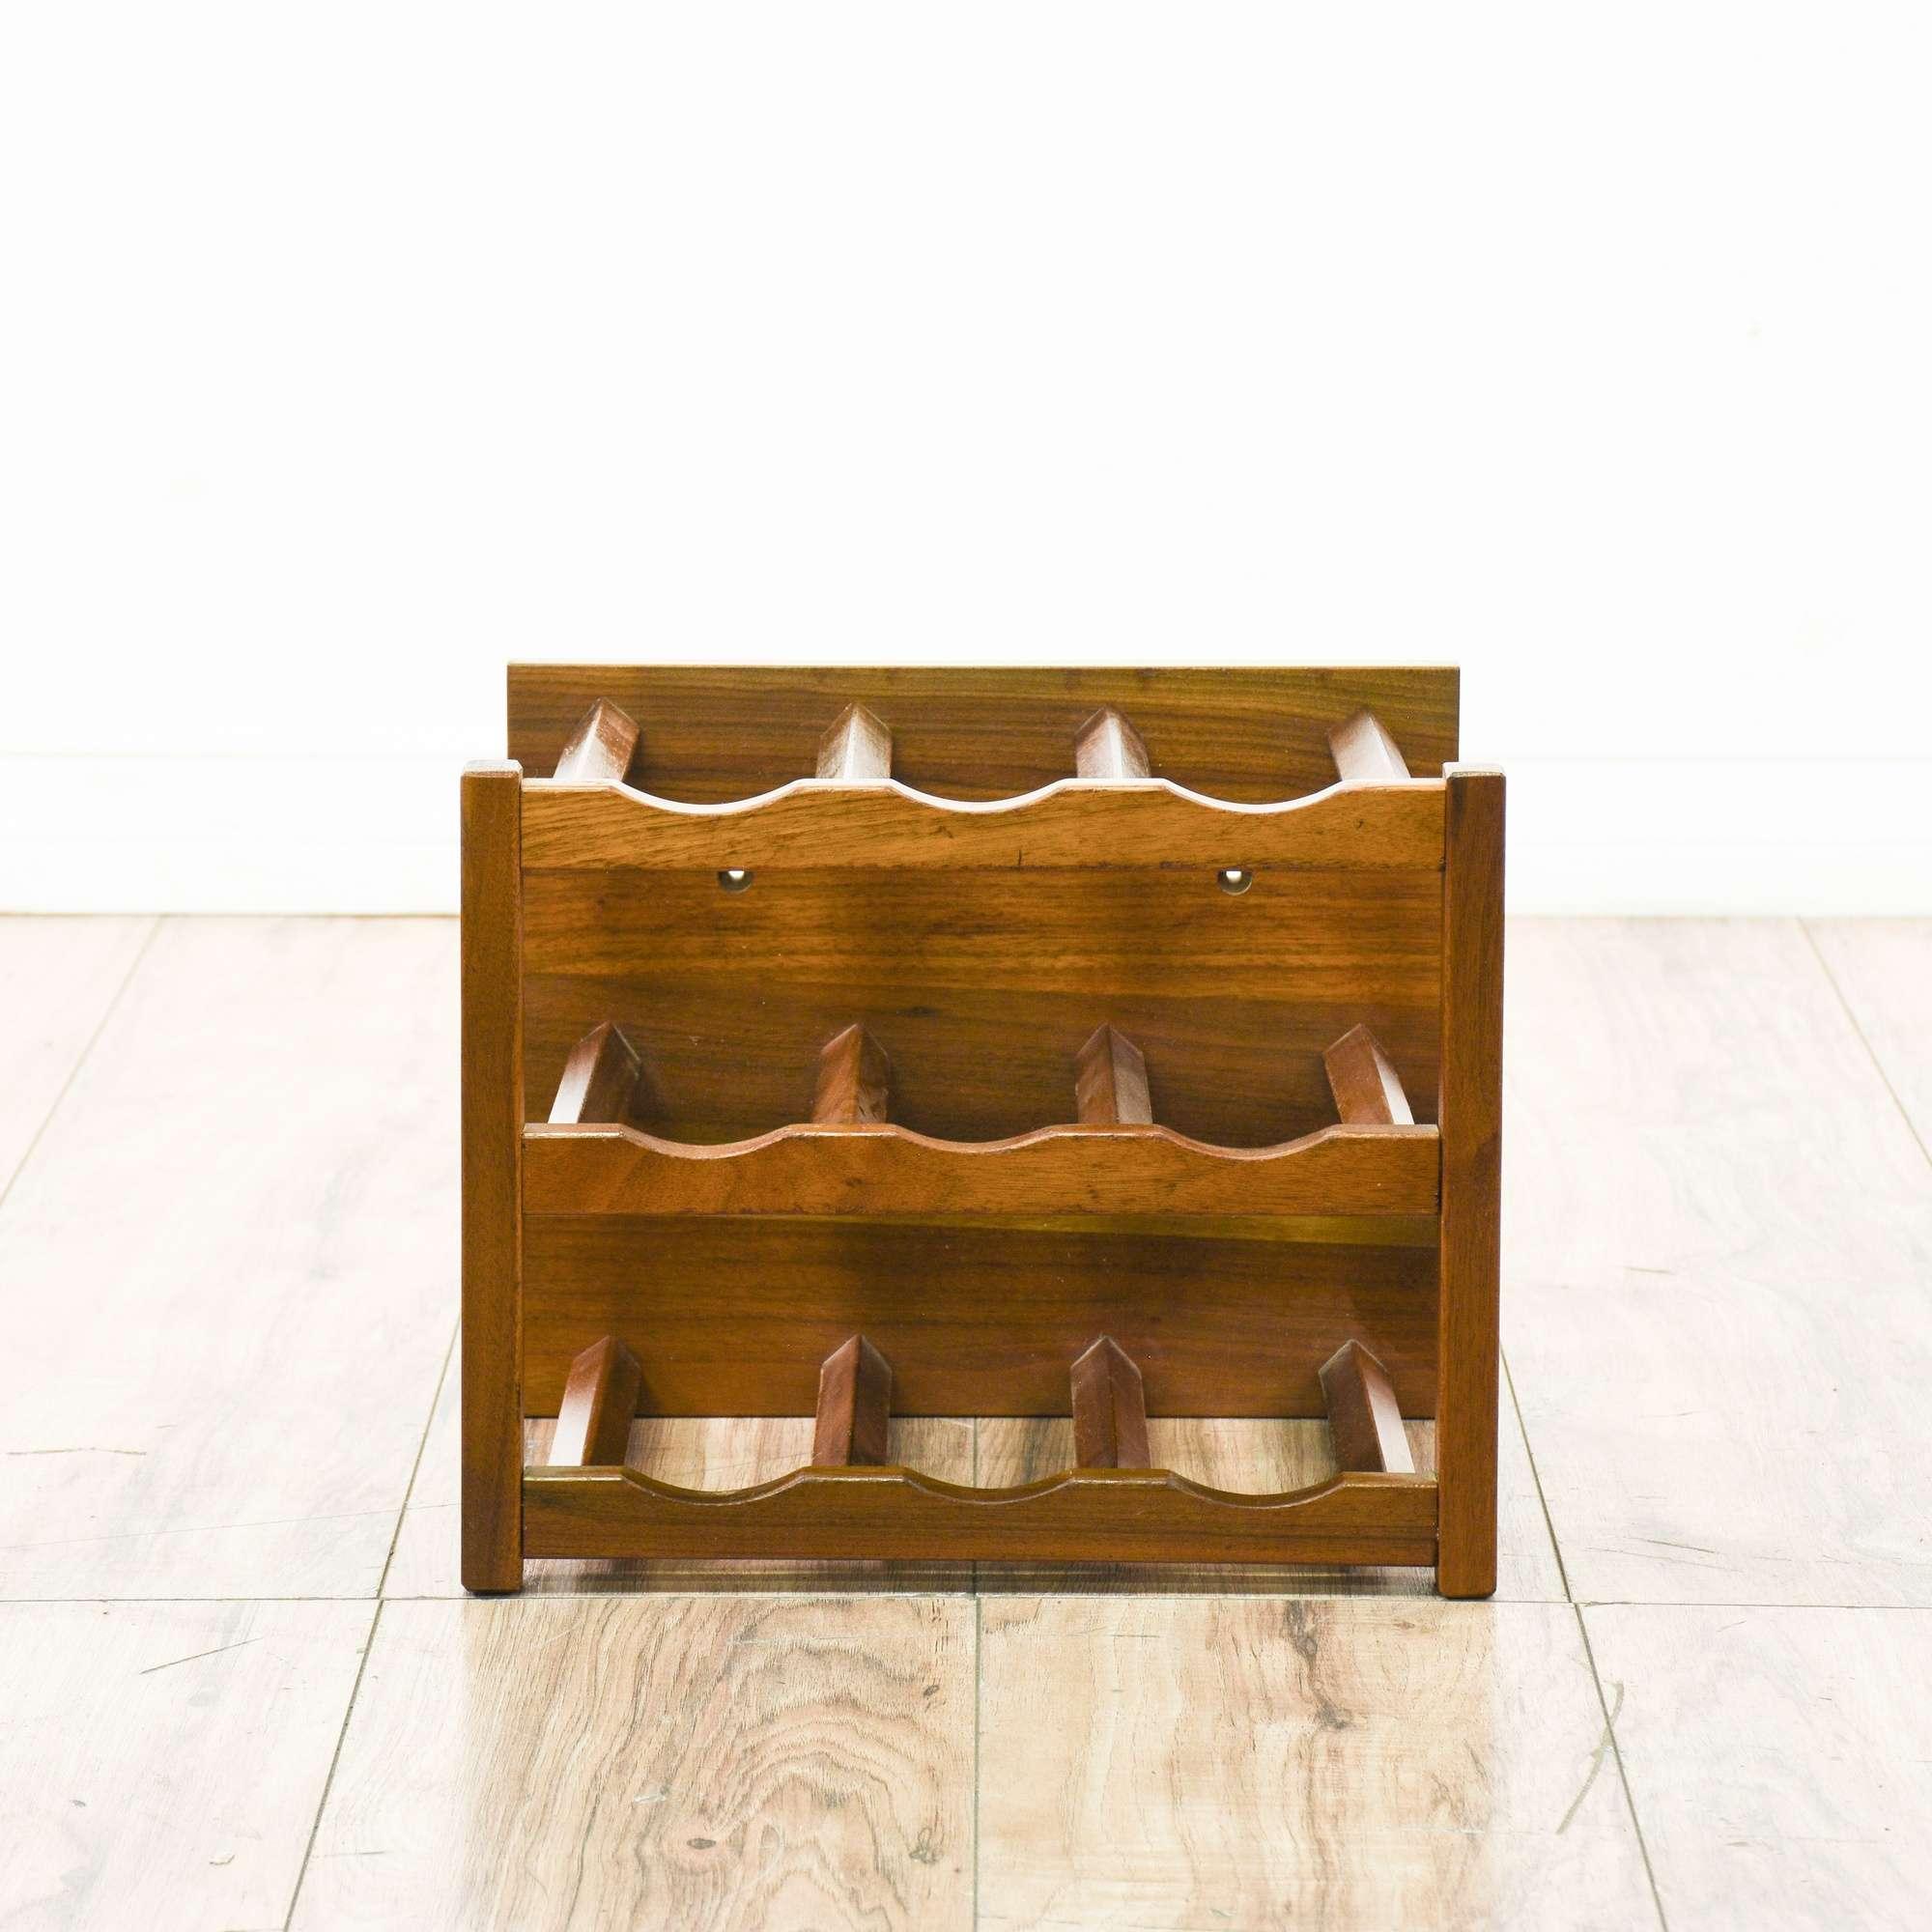 oak wooden holder wine wood bottle itm rack display stand racks countertop